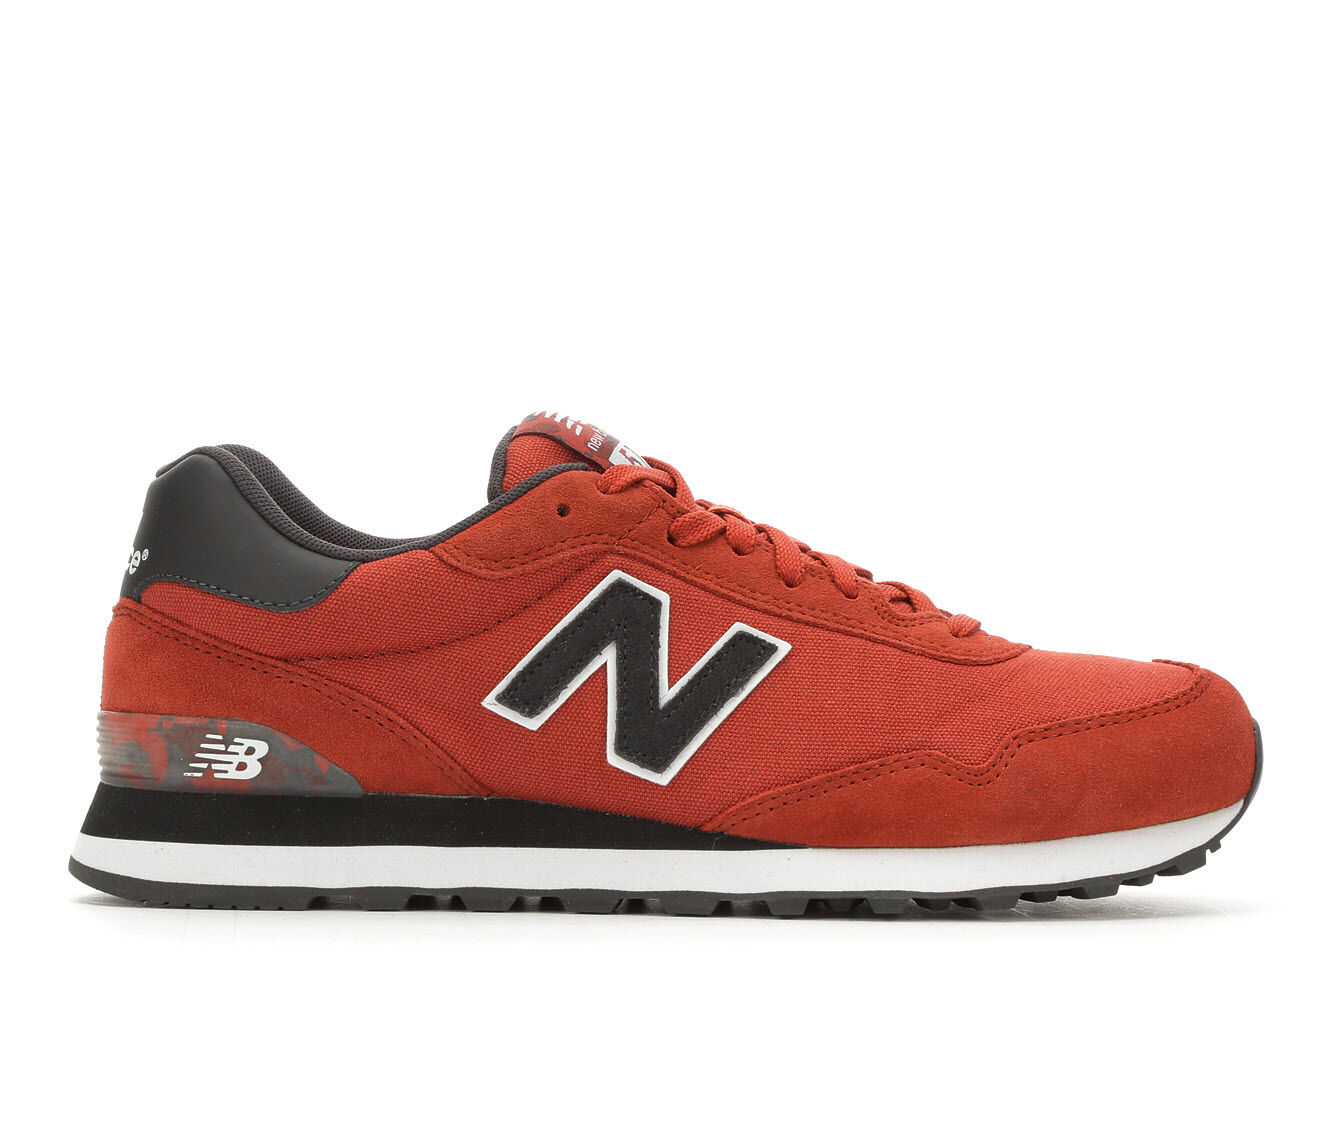 Men's New Balance ML515 Retro Sneakers Red/Blk/Wht